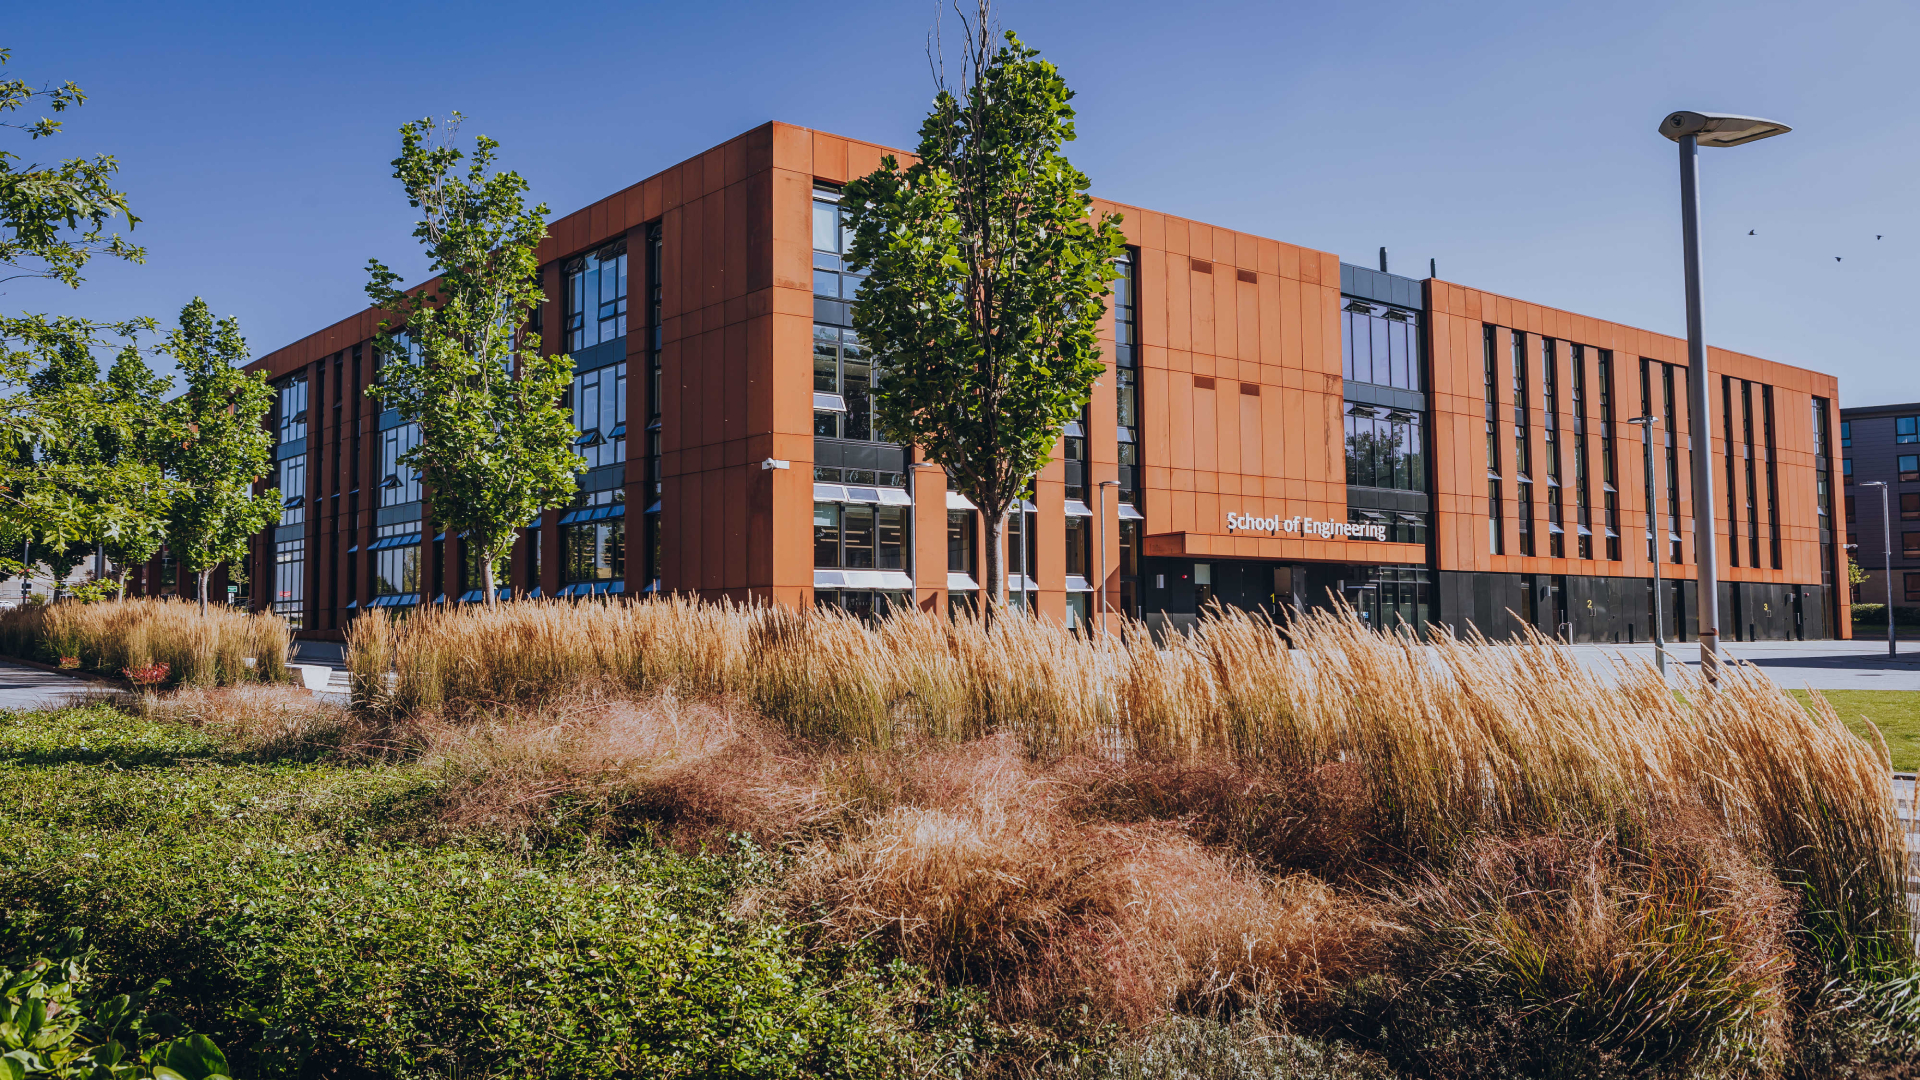 Uwe Brisol Ranking Student Review Uni Compare Bristol Accommodation Personal Statement